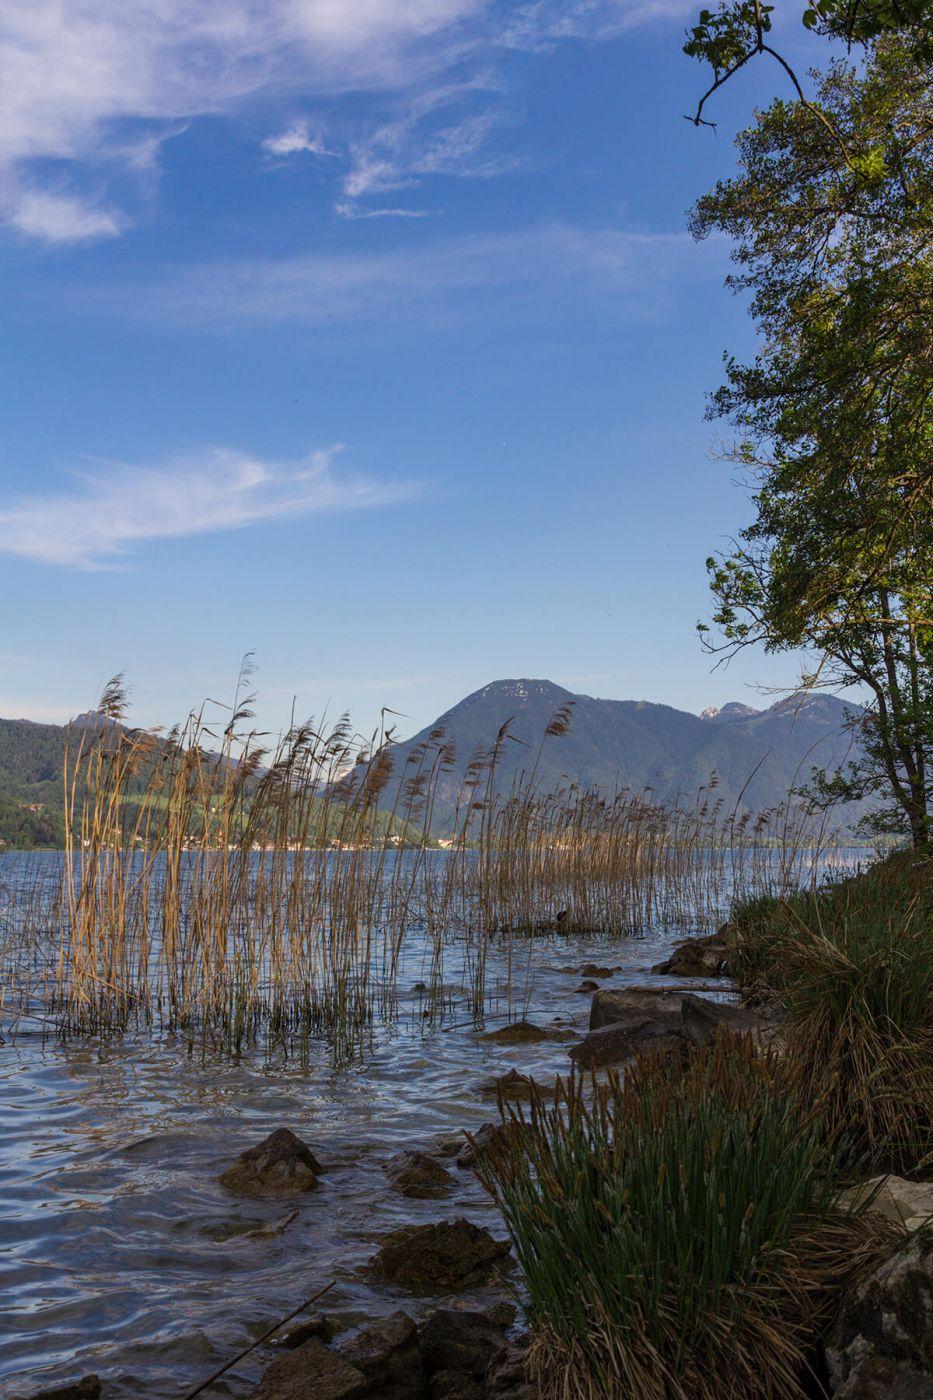 Lake Tegernsee near Holz, Germany